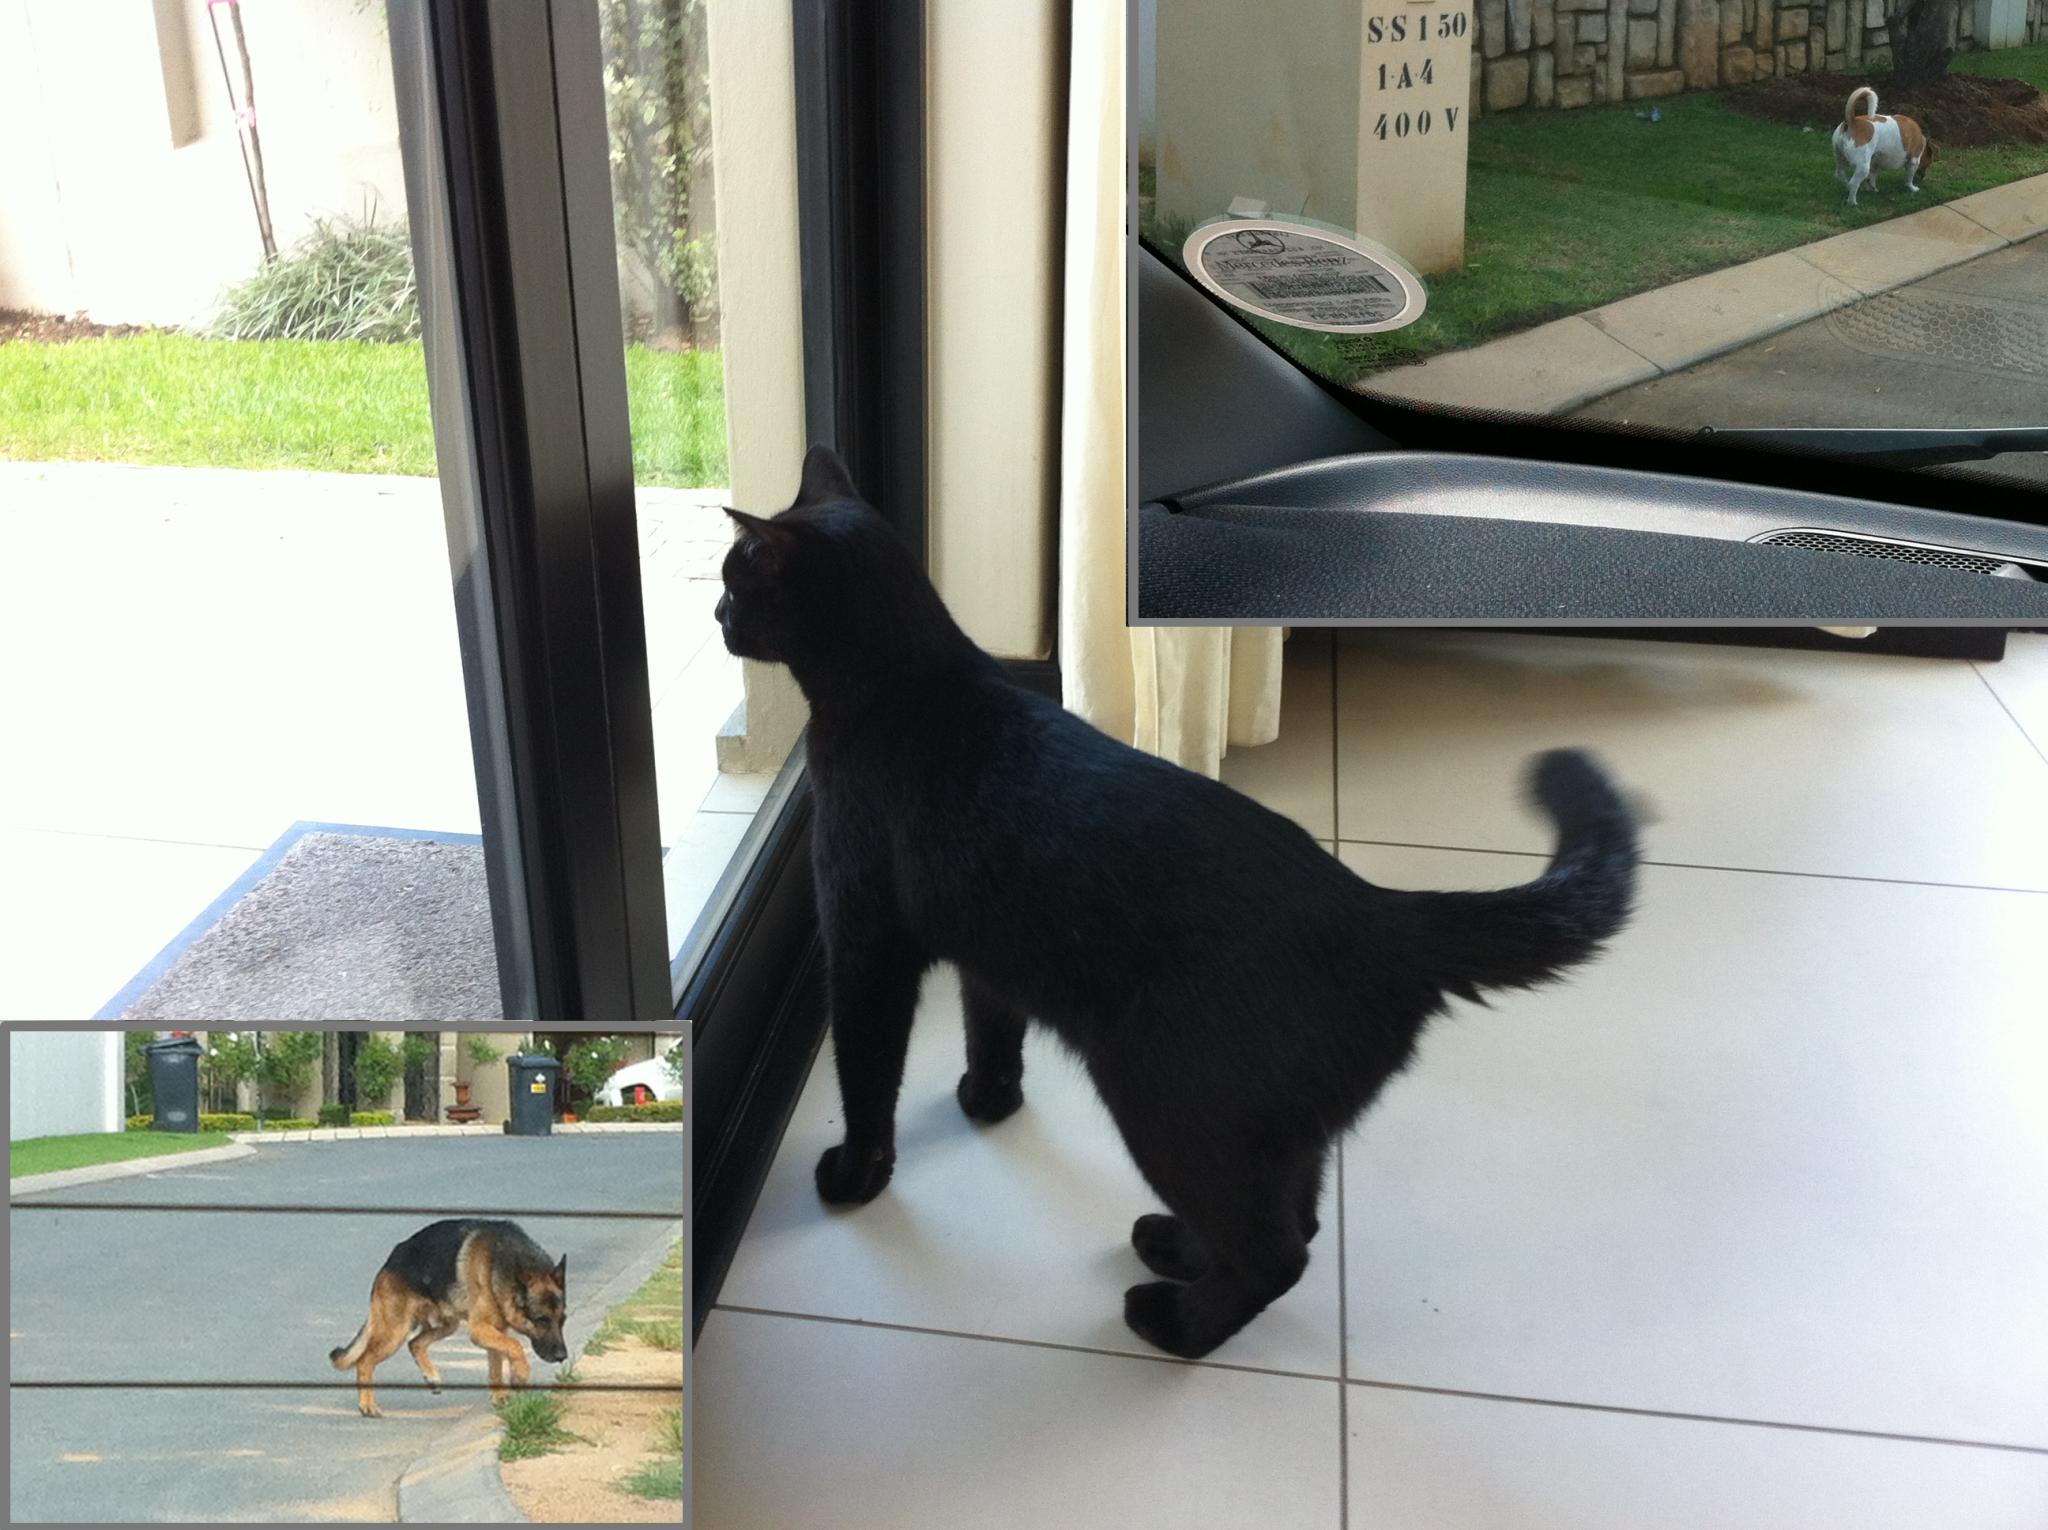 Damien locked inside - Dogs roaming the estate unleashed